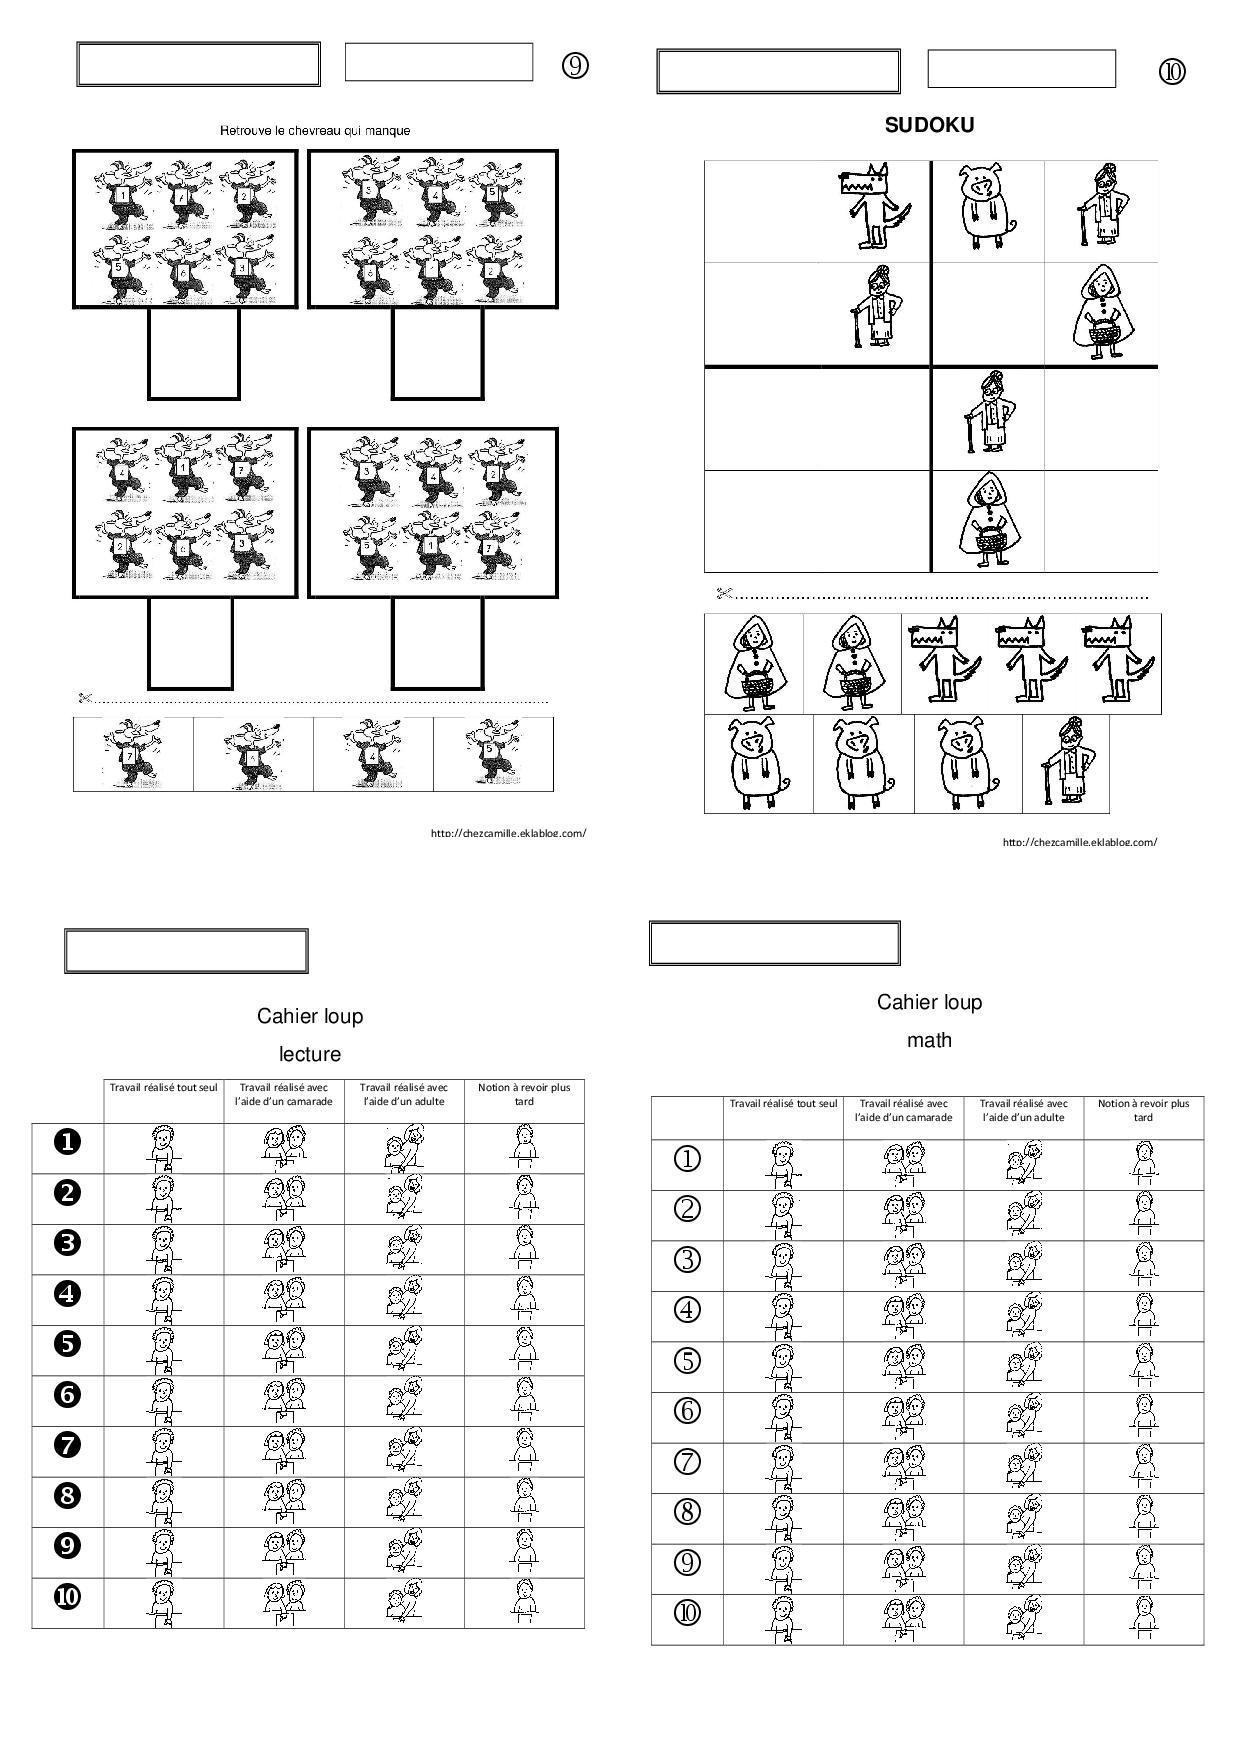 100+ [ Sudoku Lettres ] | Se Cultiver Et Se Détendre Ardoiz encequiconcerne Sudoku Maternelle À Imprimer